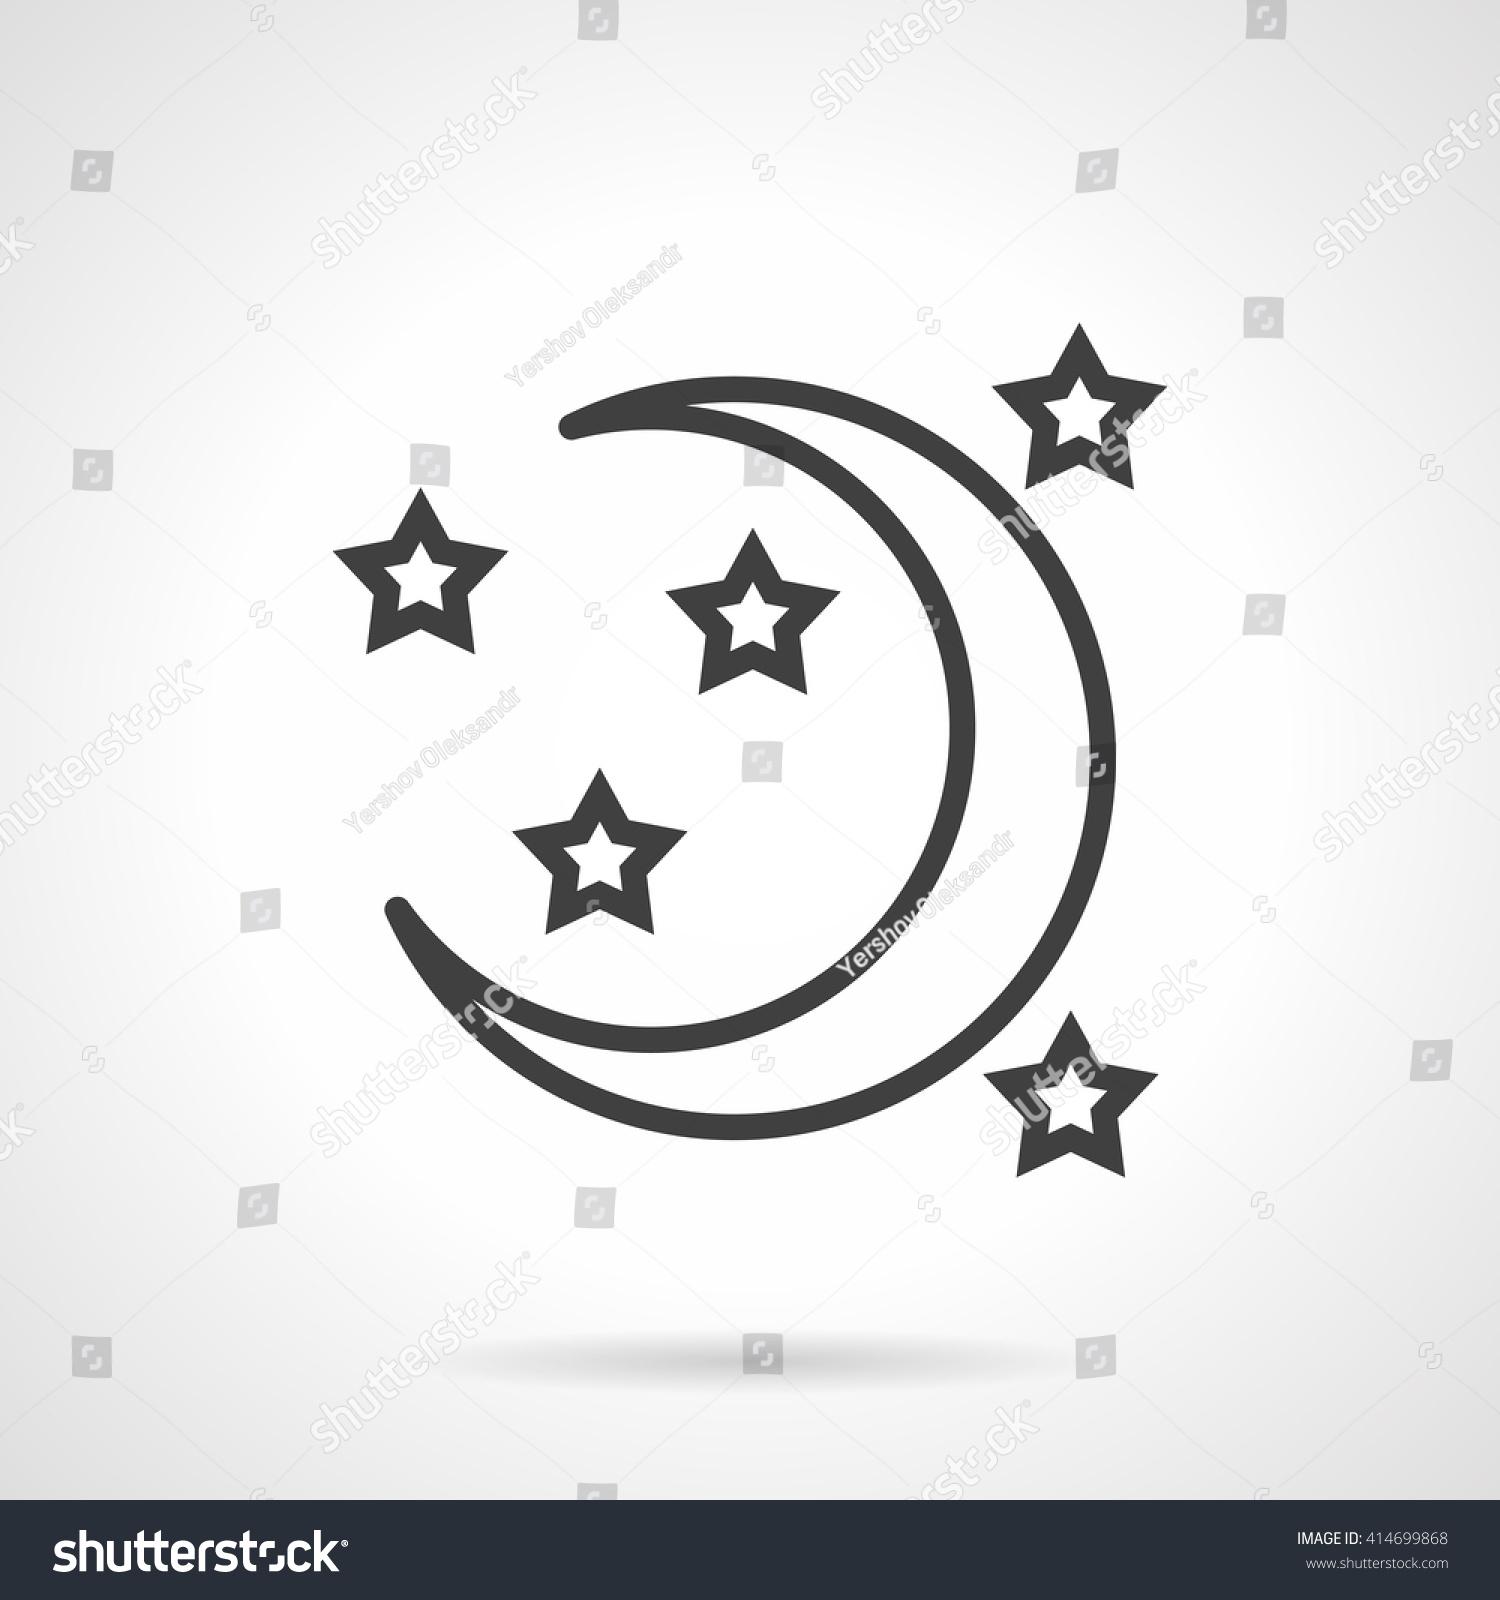 moon black singles Black moon top songs top songs / chart singles discography 5ft • buckshot • dj evil dee search in  amazoncomcoukcadefresit ebay wikipedia : songs.